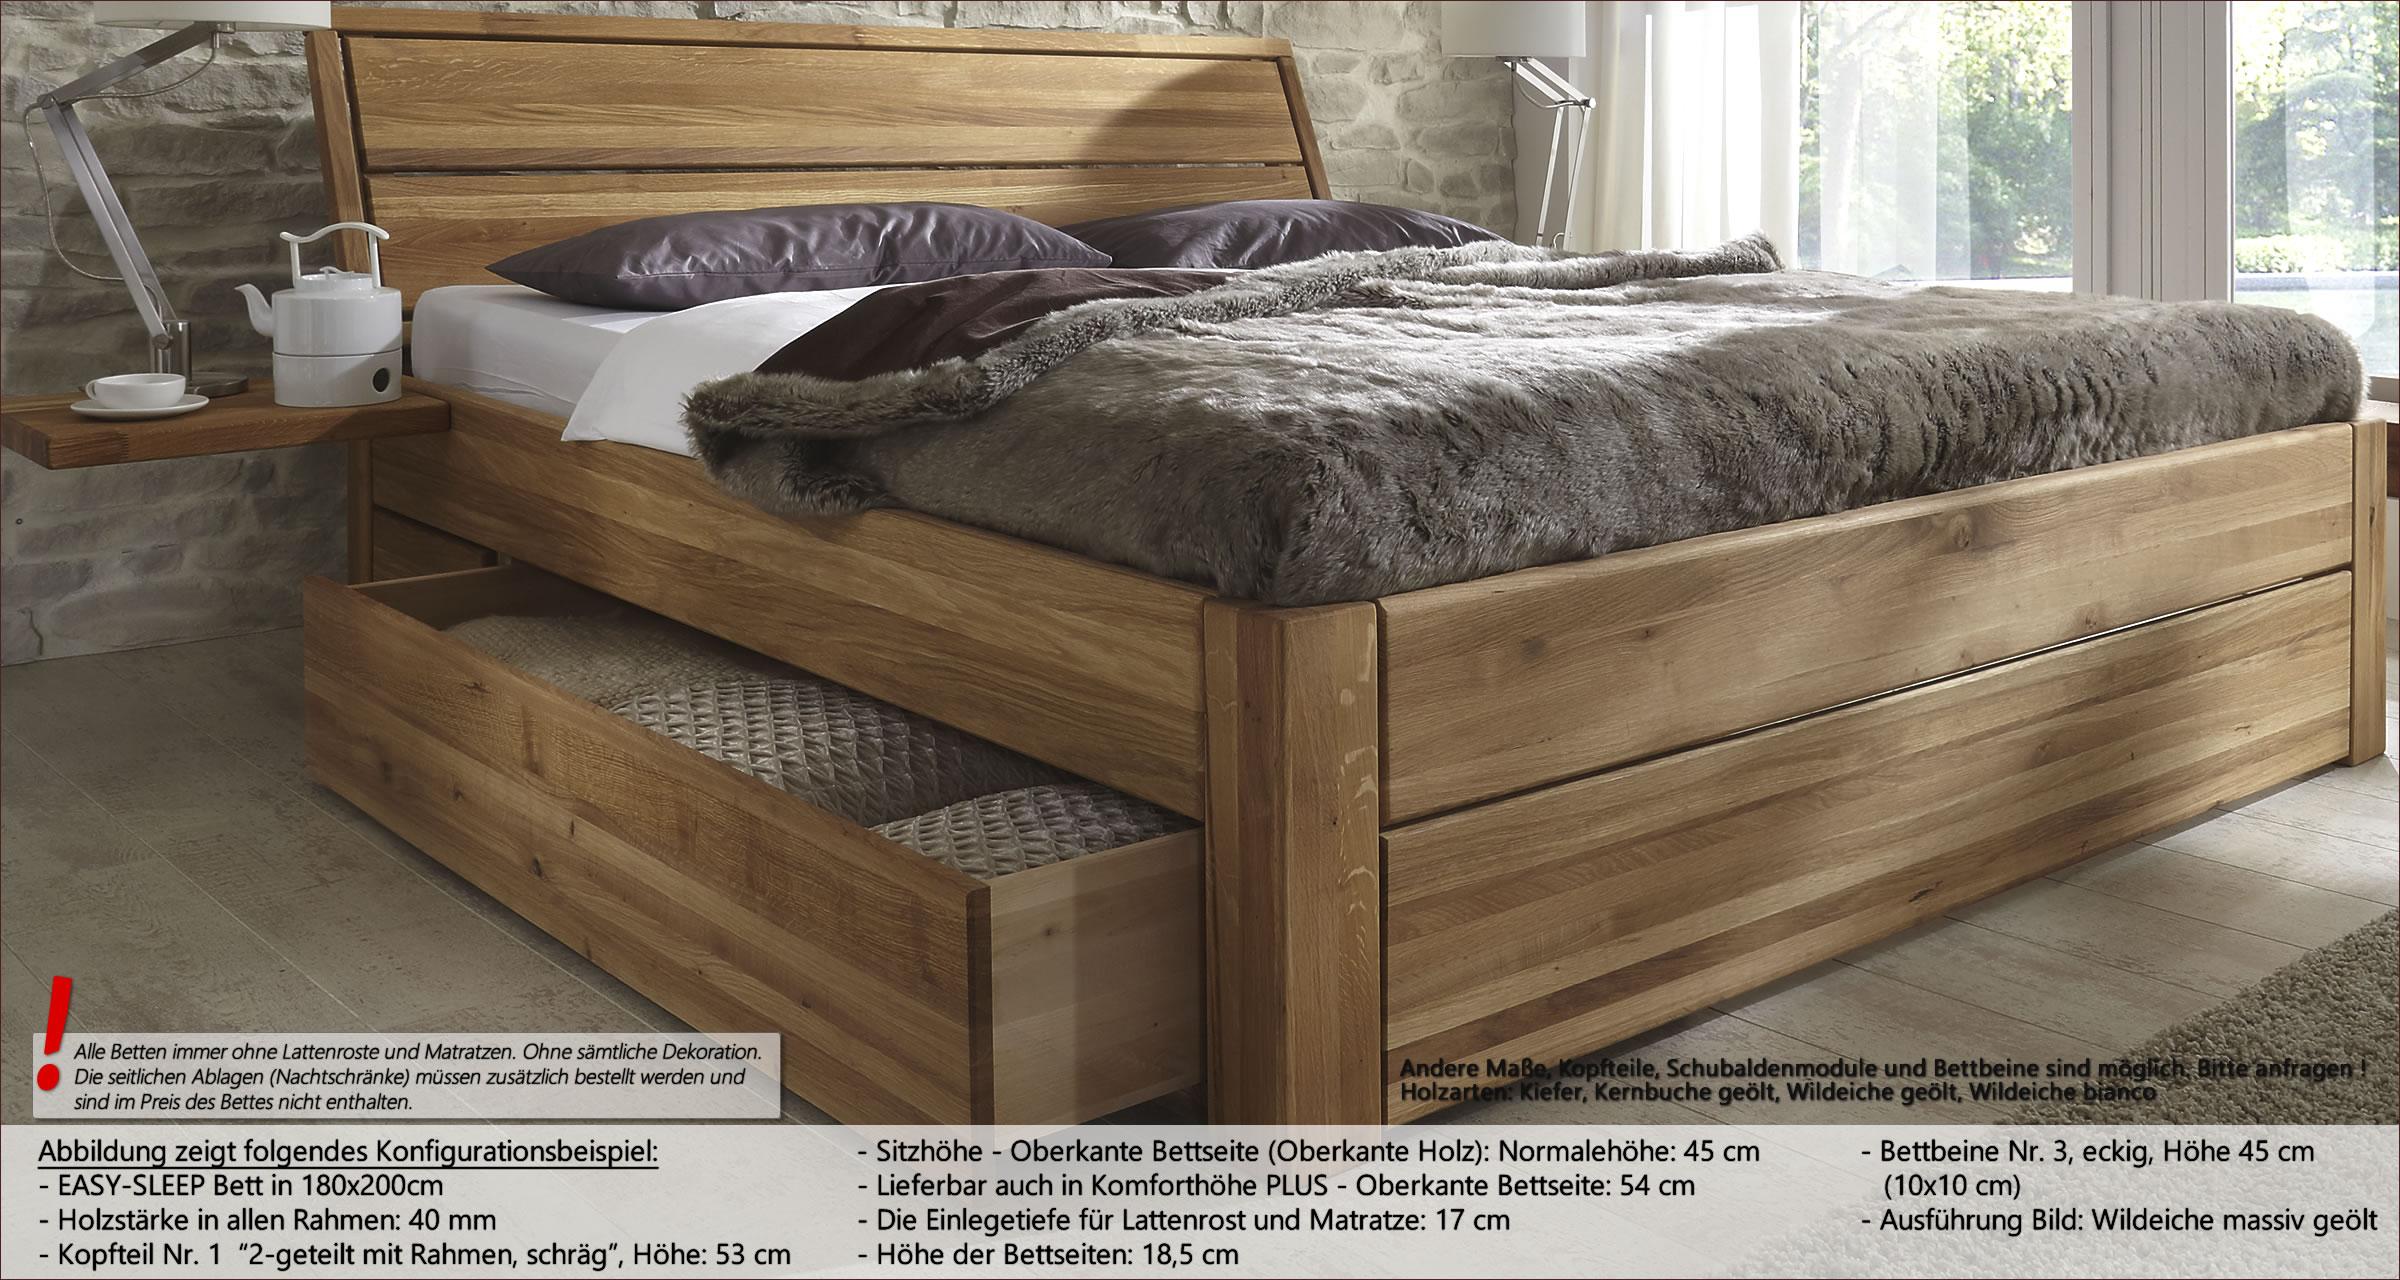 Betten Wasserbetten Mobel Rauch Bett 3 Schubkasten Komforthohe